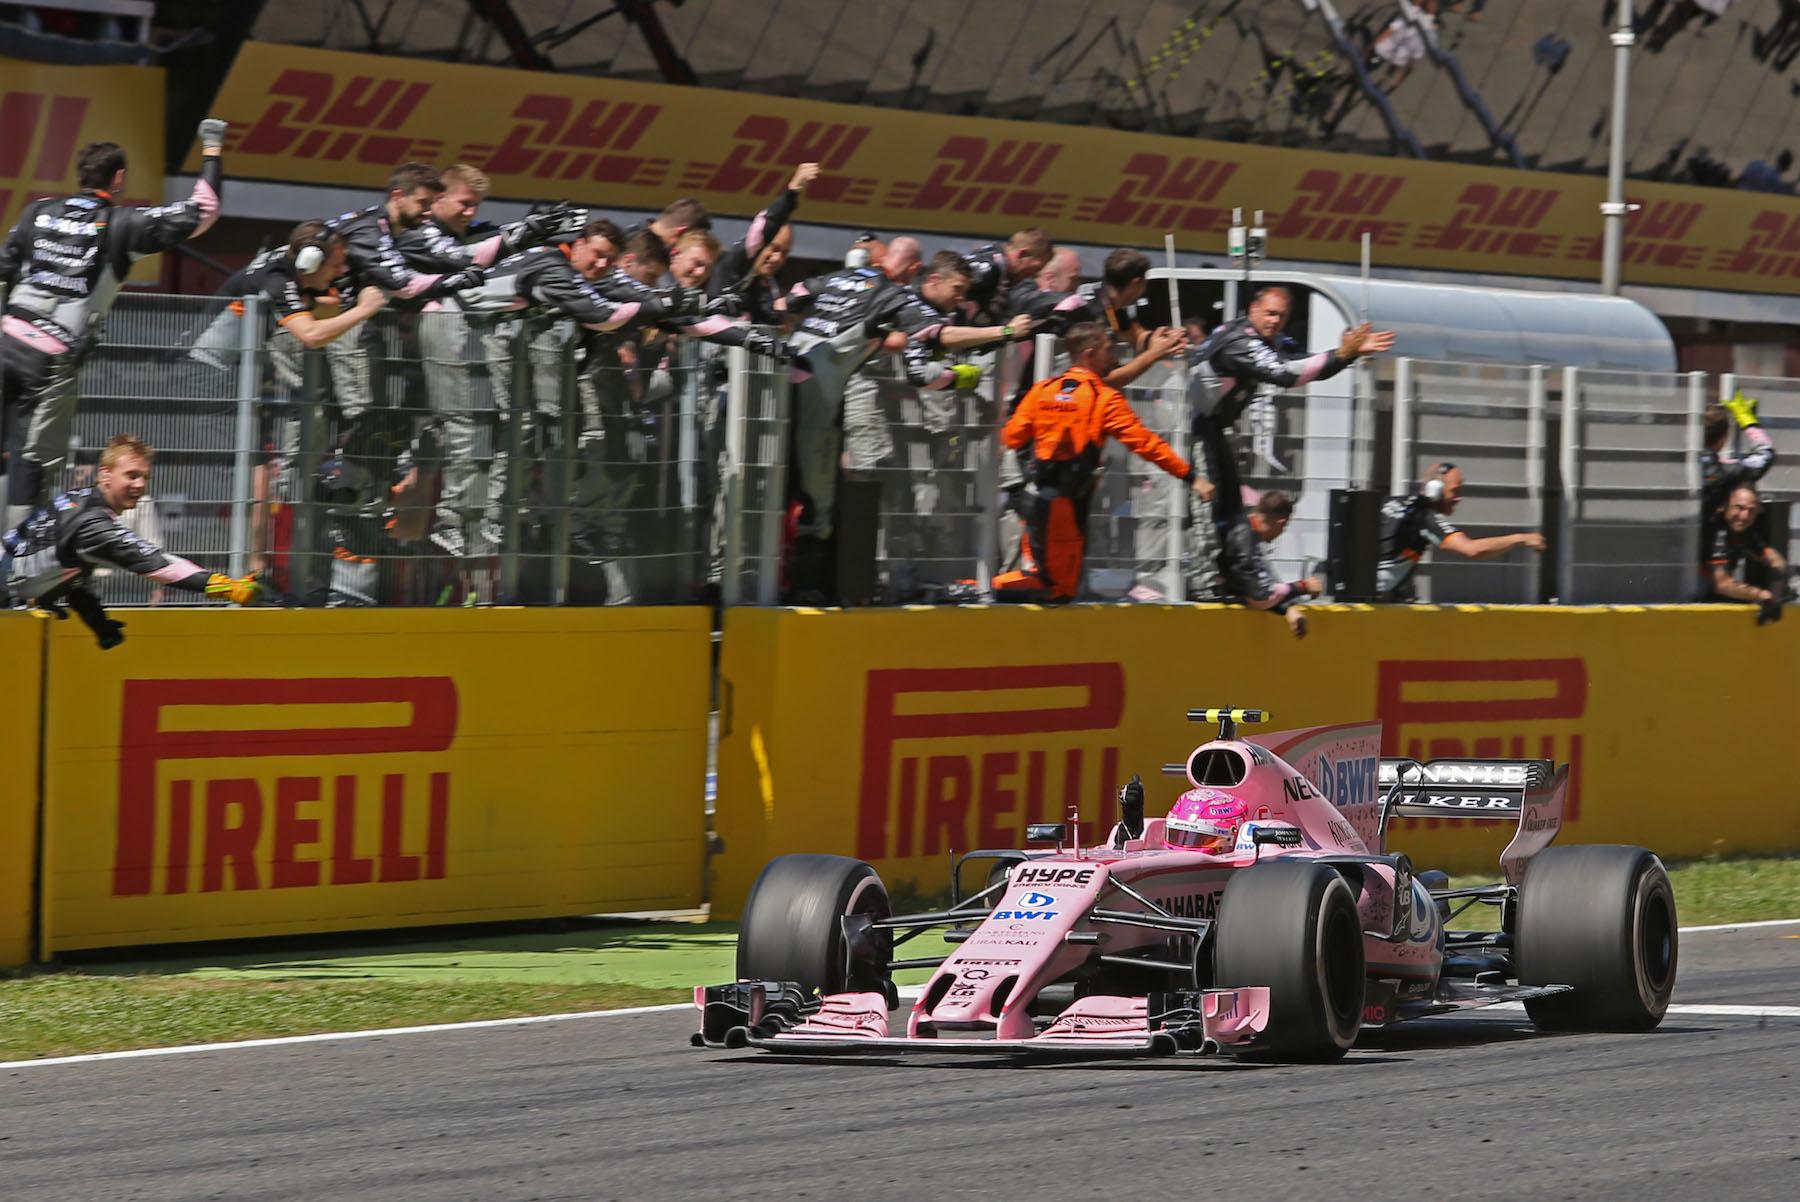 R 2017 Esteban Ocon | Force India VJM10 | 2017 Spanish GP P5 1 copy.jpg